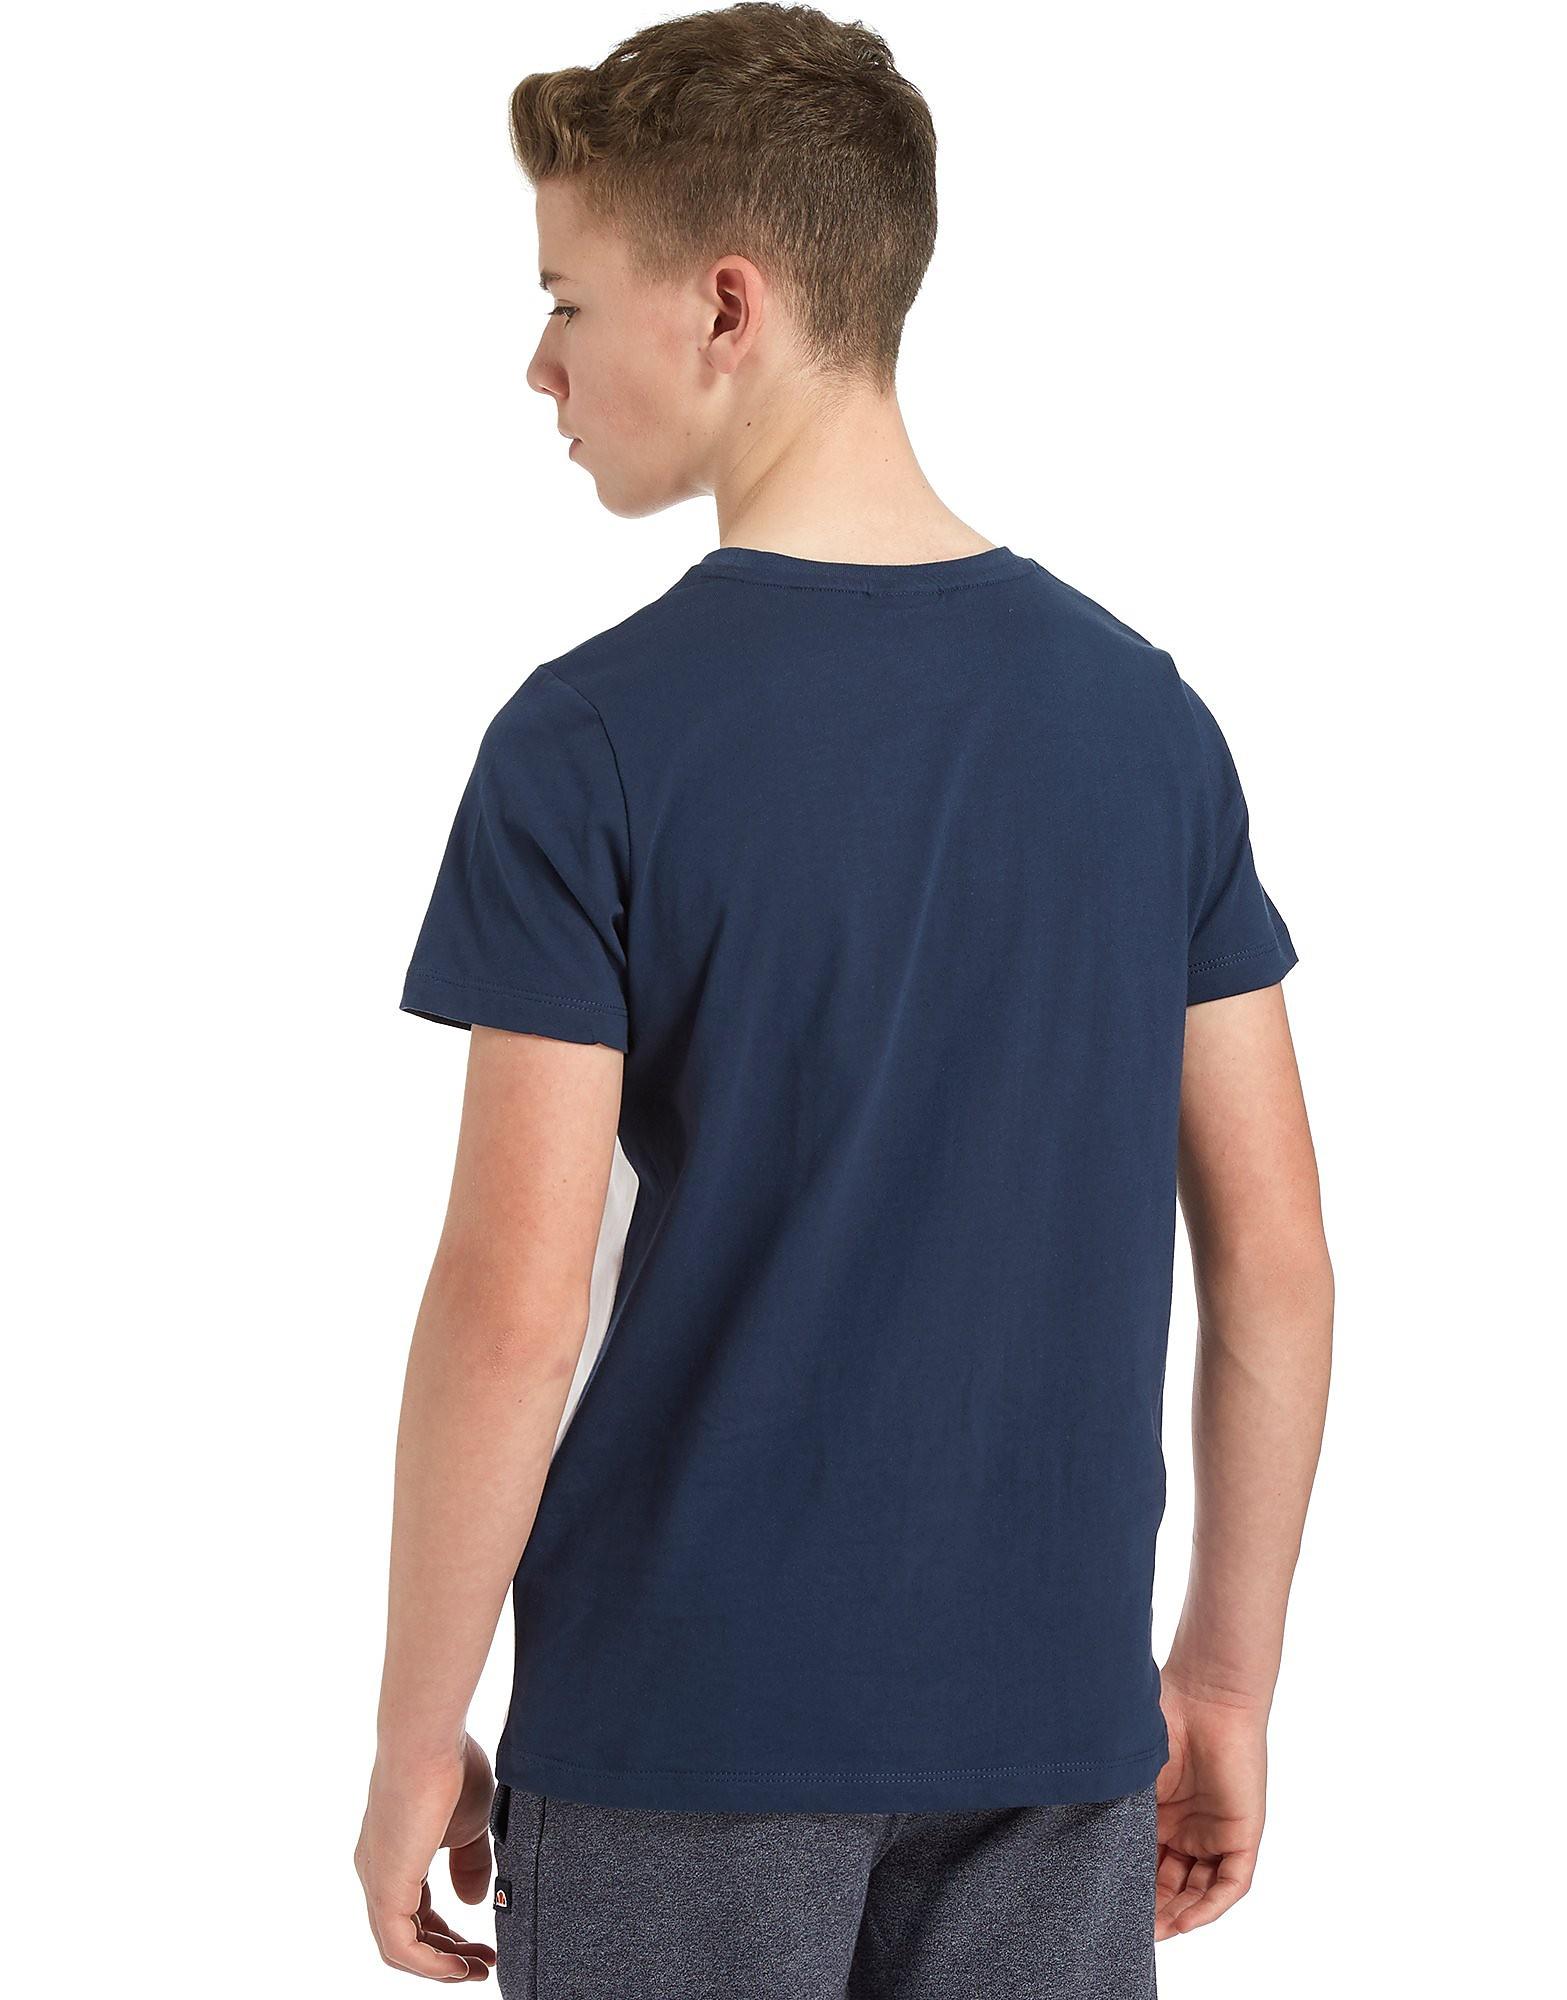 Ellesse camiseta Colourblock Jersey júnior